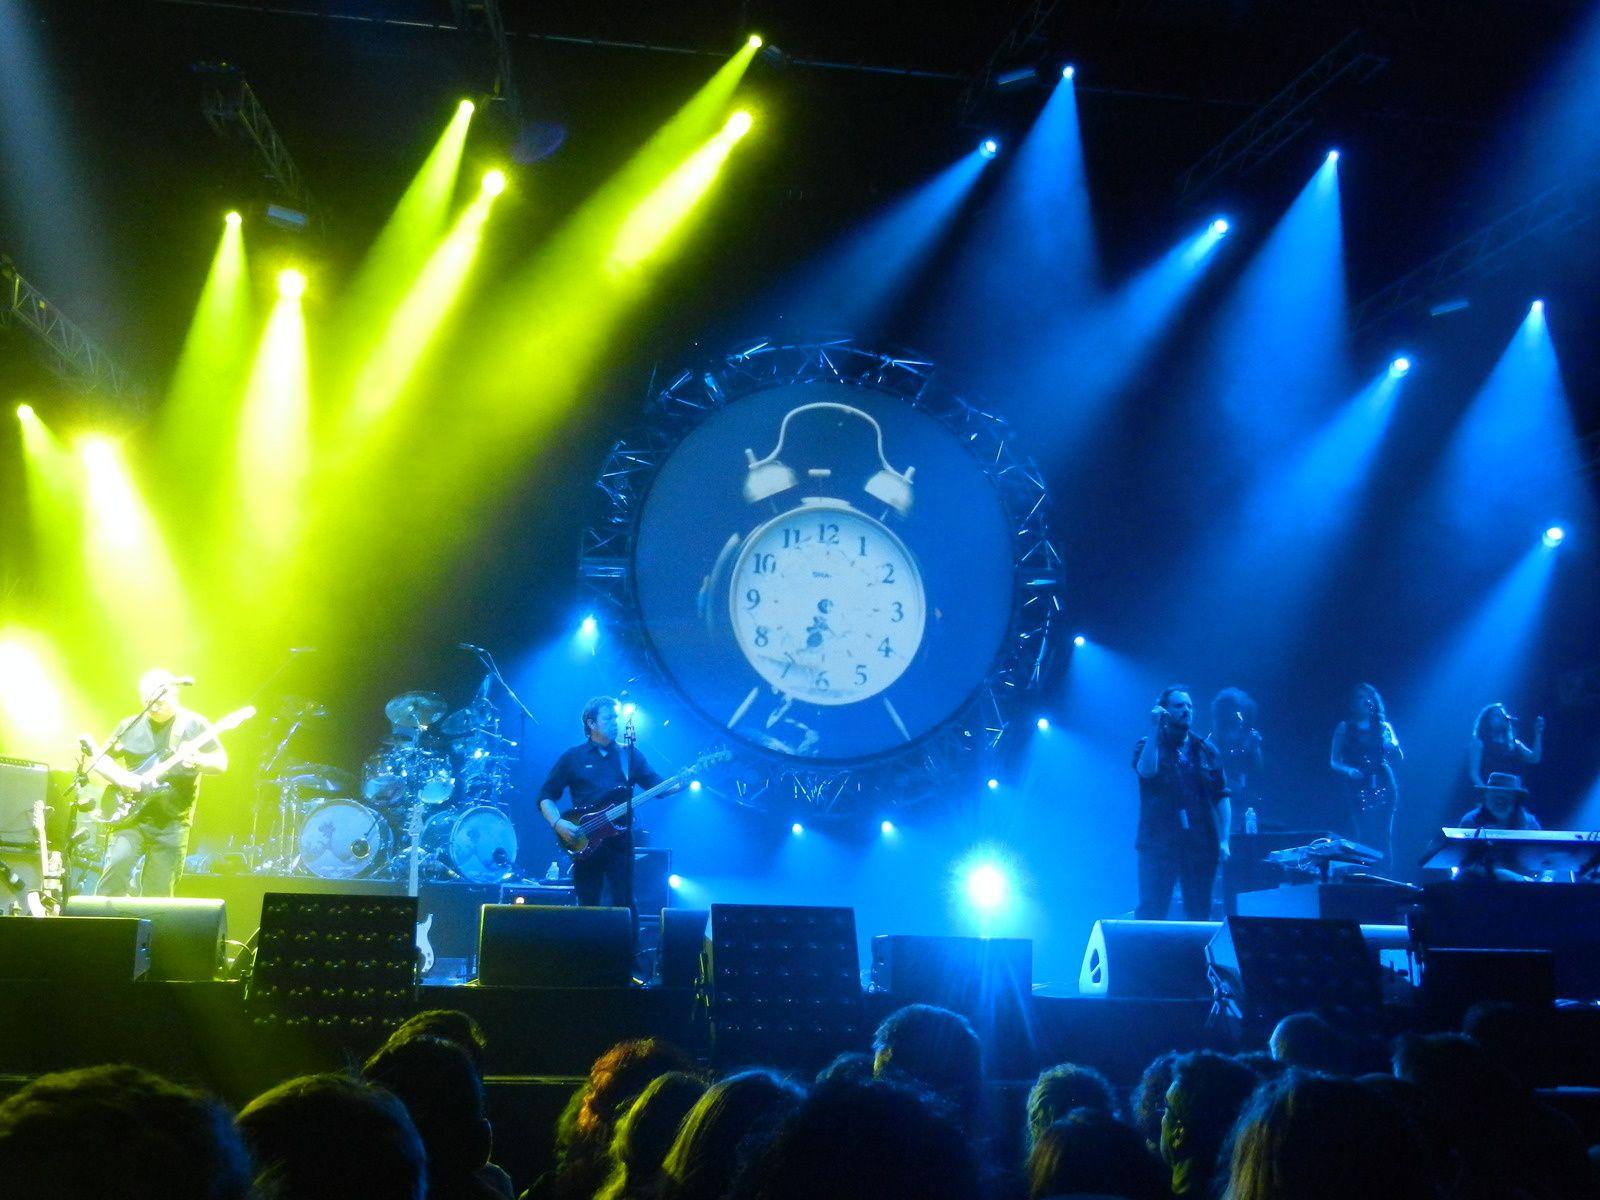 Mercredi 28 janvier 2015 Zénith d'Orléans : The Australian Pink Floyd Show